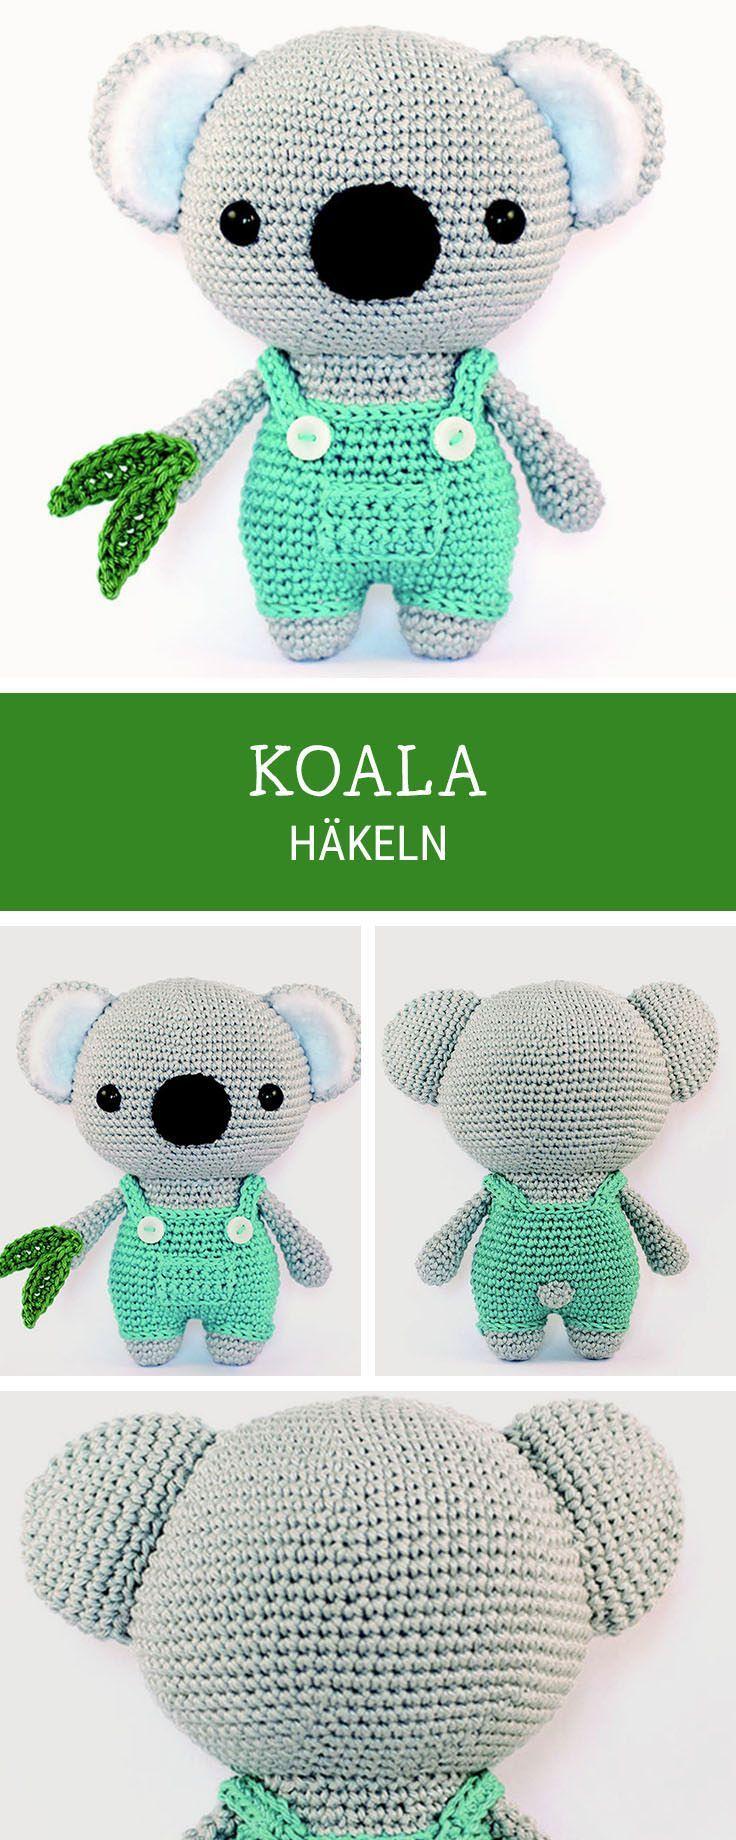 Häkeln - DIY-Anleitungen | Amigurumi patterns, Crochet and Sew baby